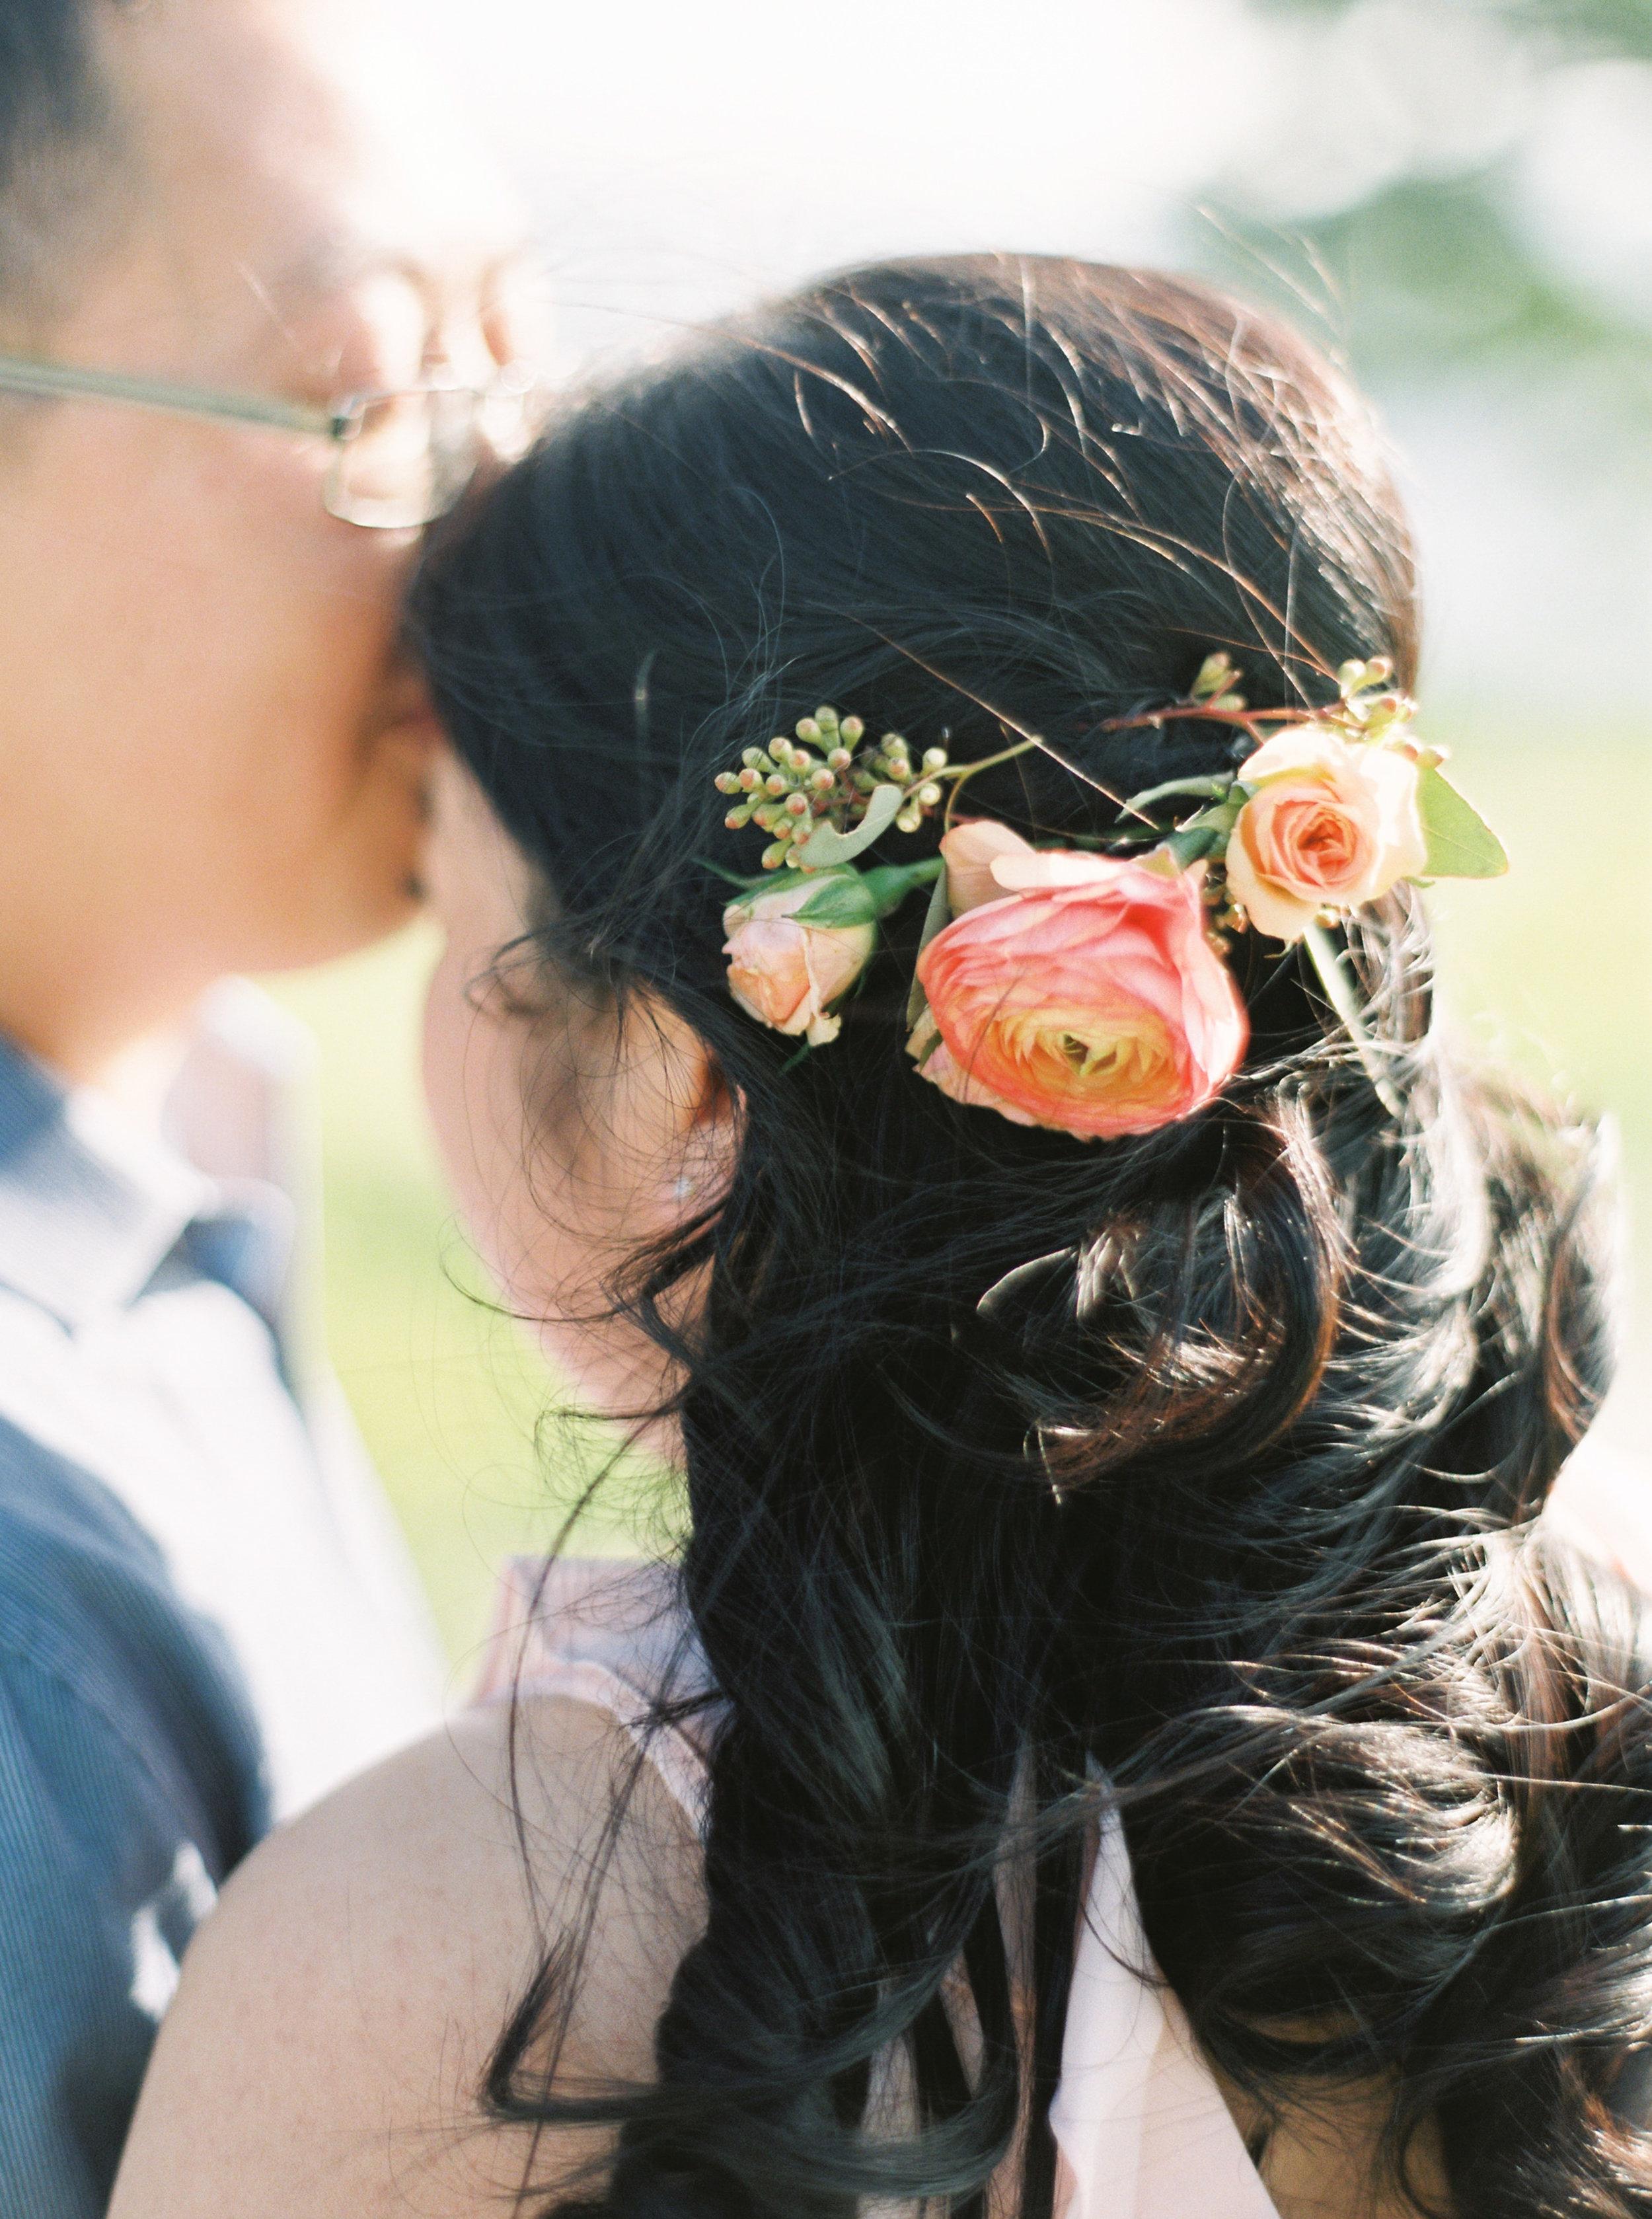 del-valle-livermore-bay-area-wedding-photographer-79.jpg